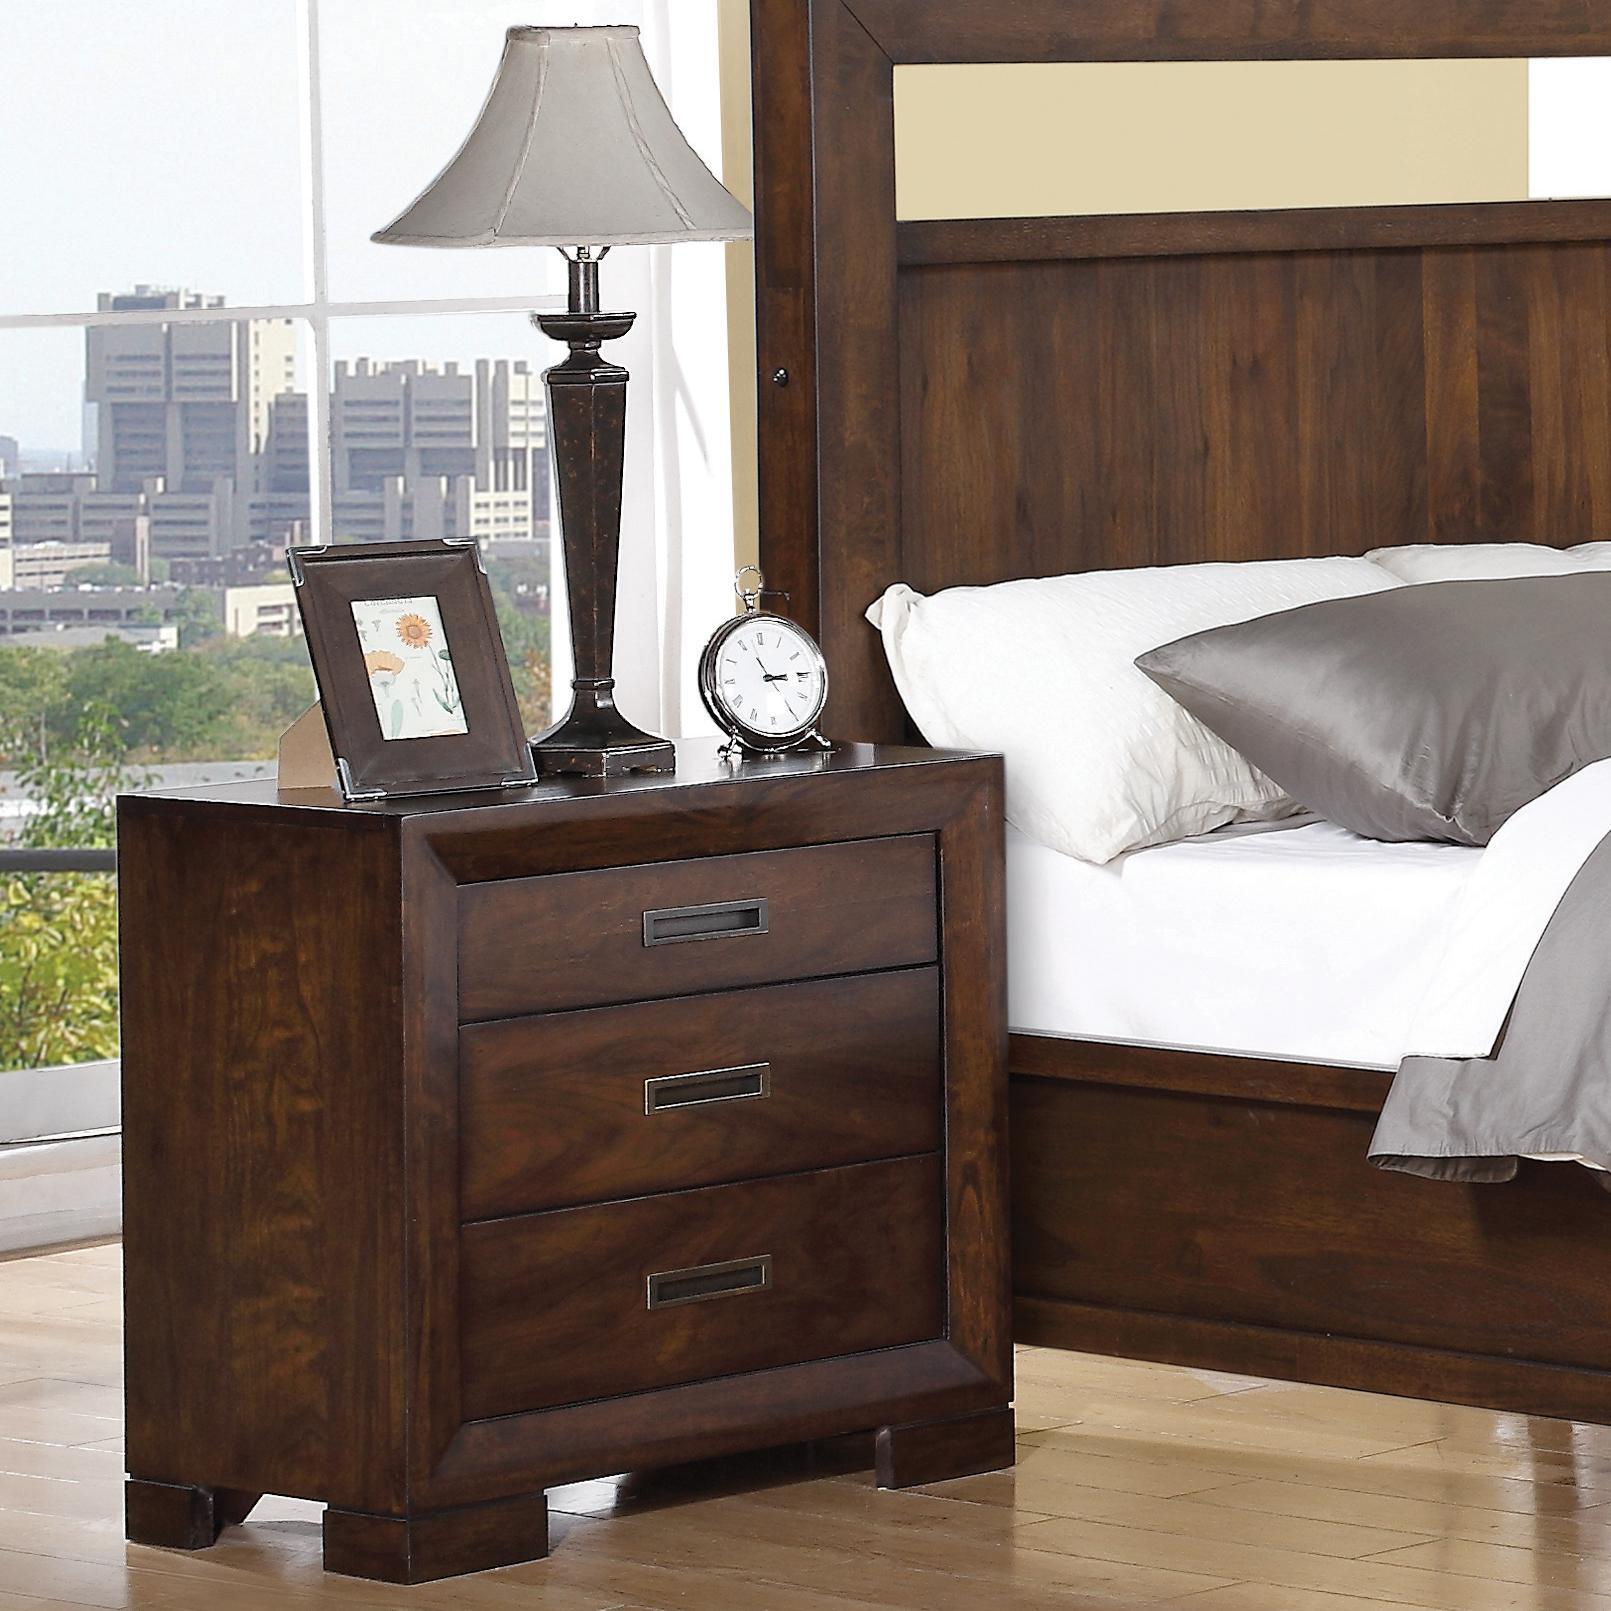 Riverside Furniture Riata Contemporary 3 Drawer Nightstand Jacksonville Furniture Mart Night